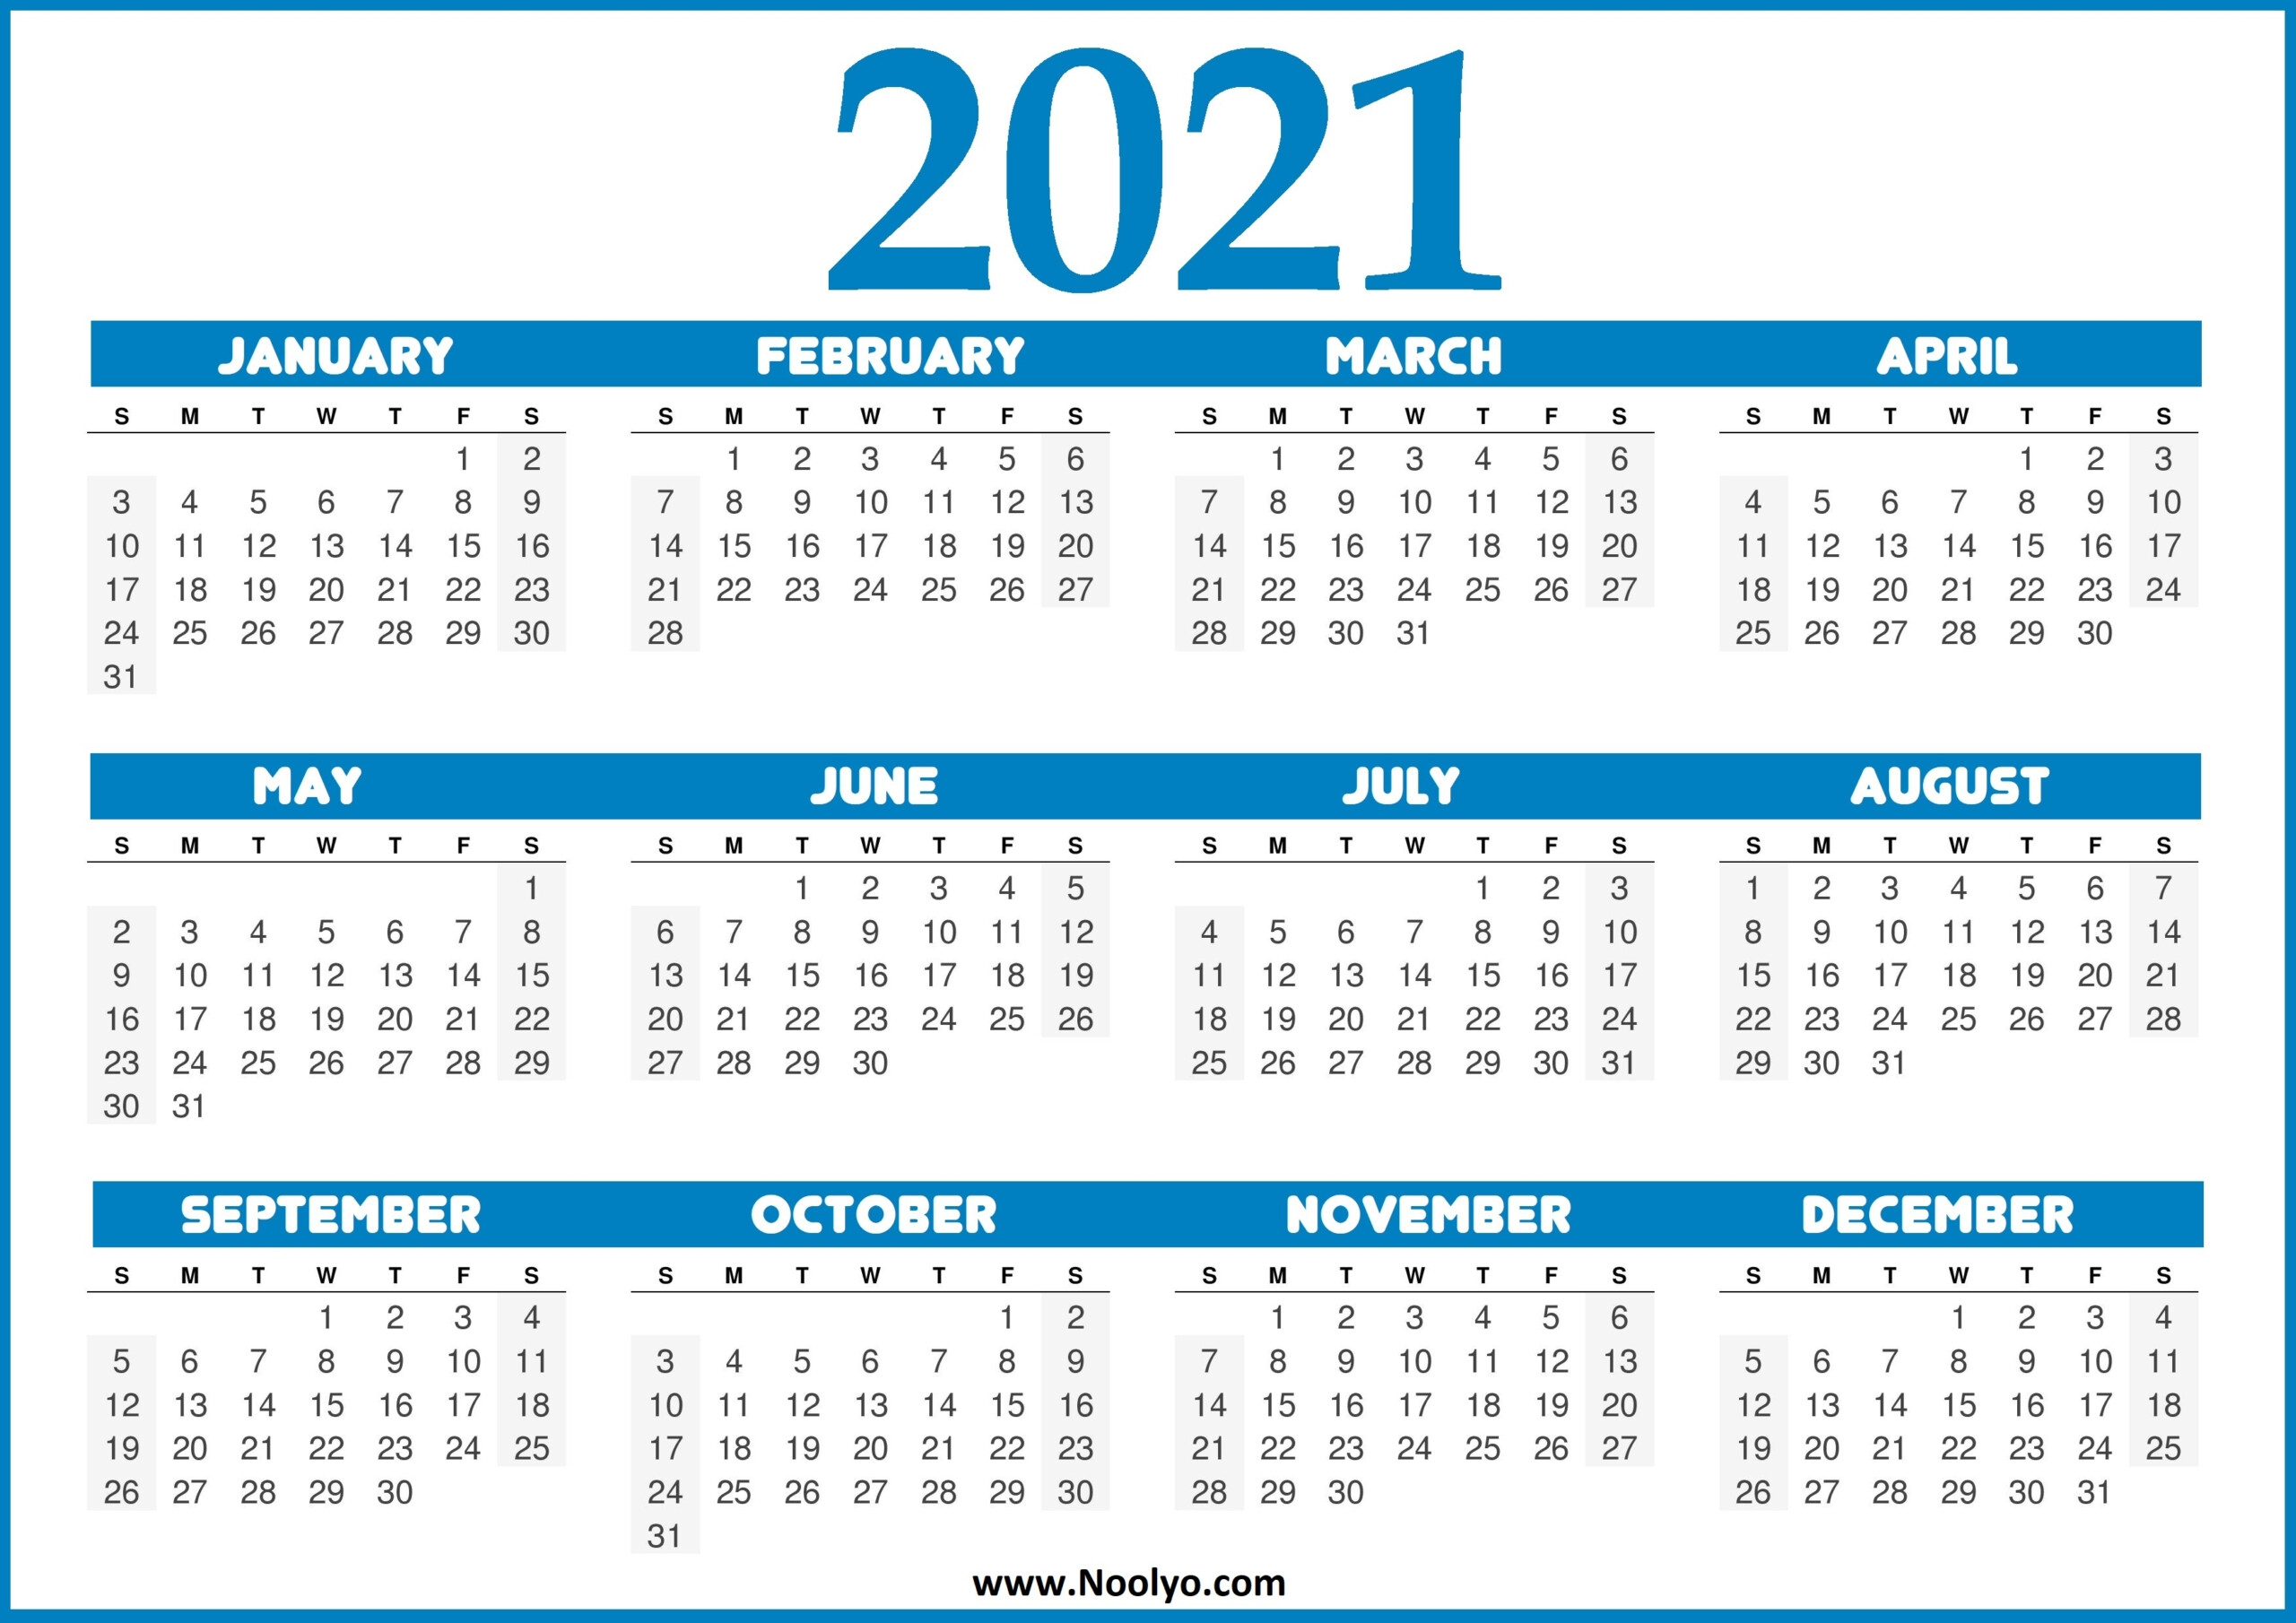 printable calendar 2021 united states free 2021 printable calendars::Printable 2021 Calendar By Week